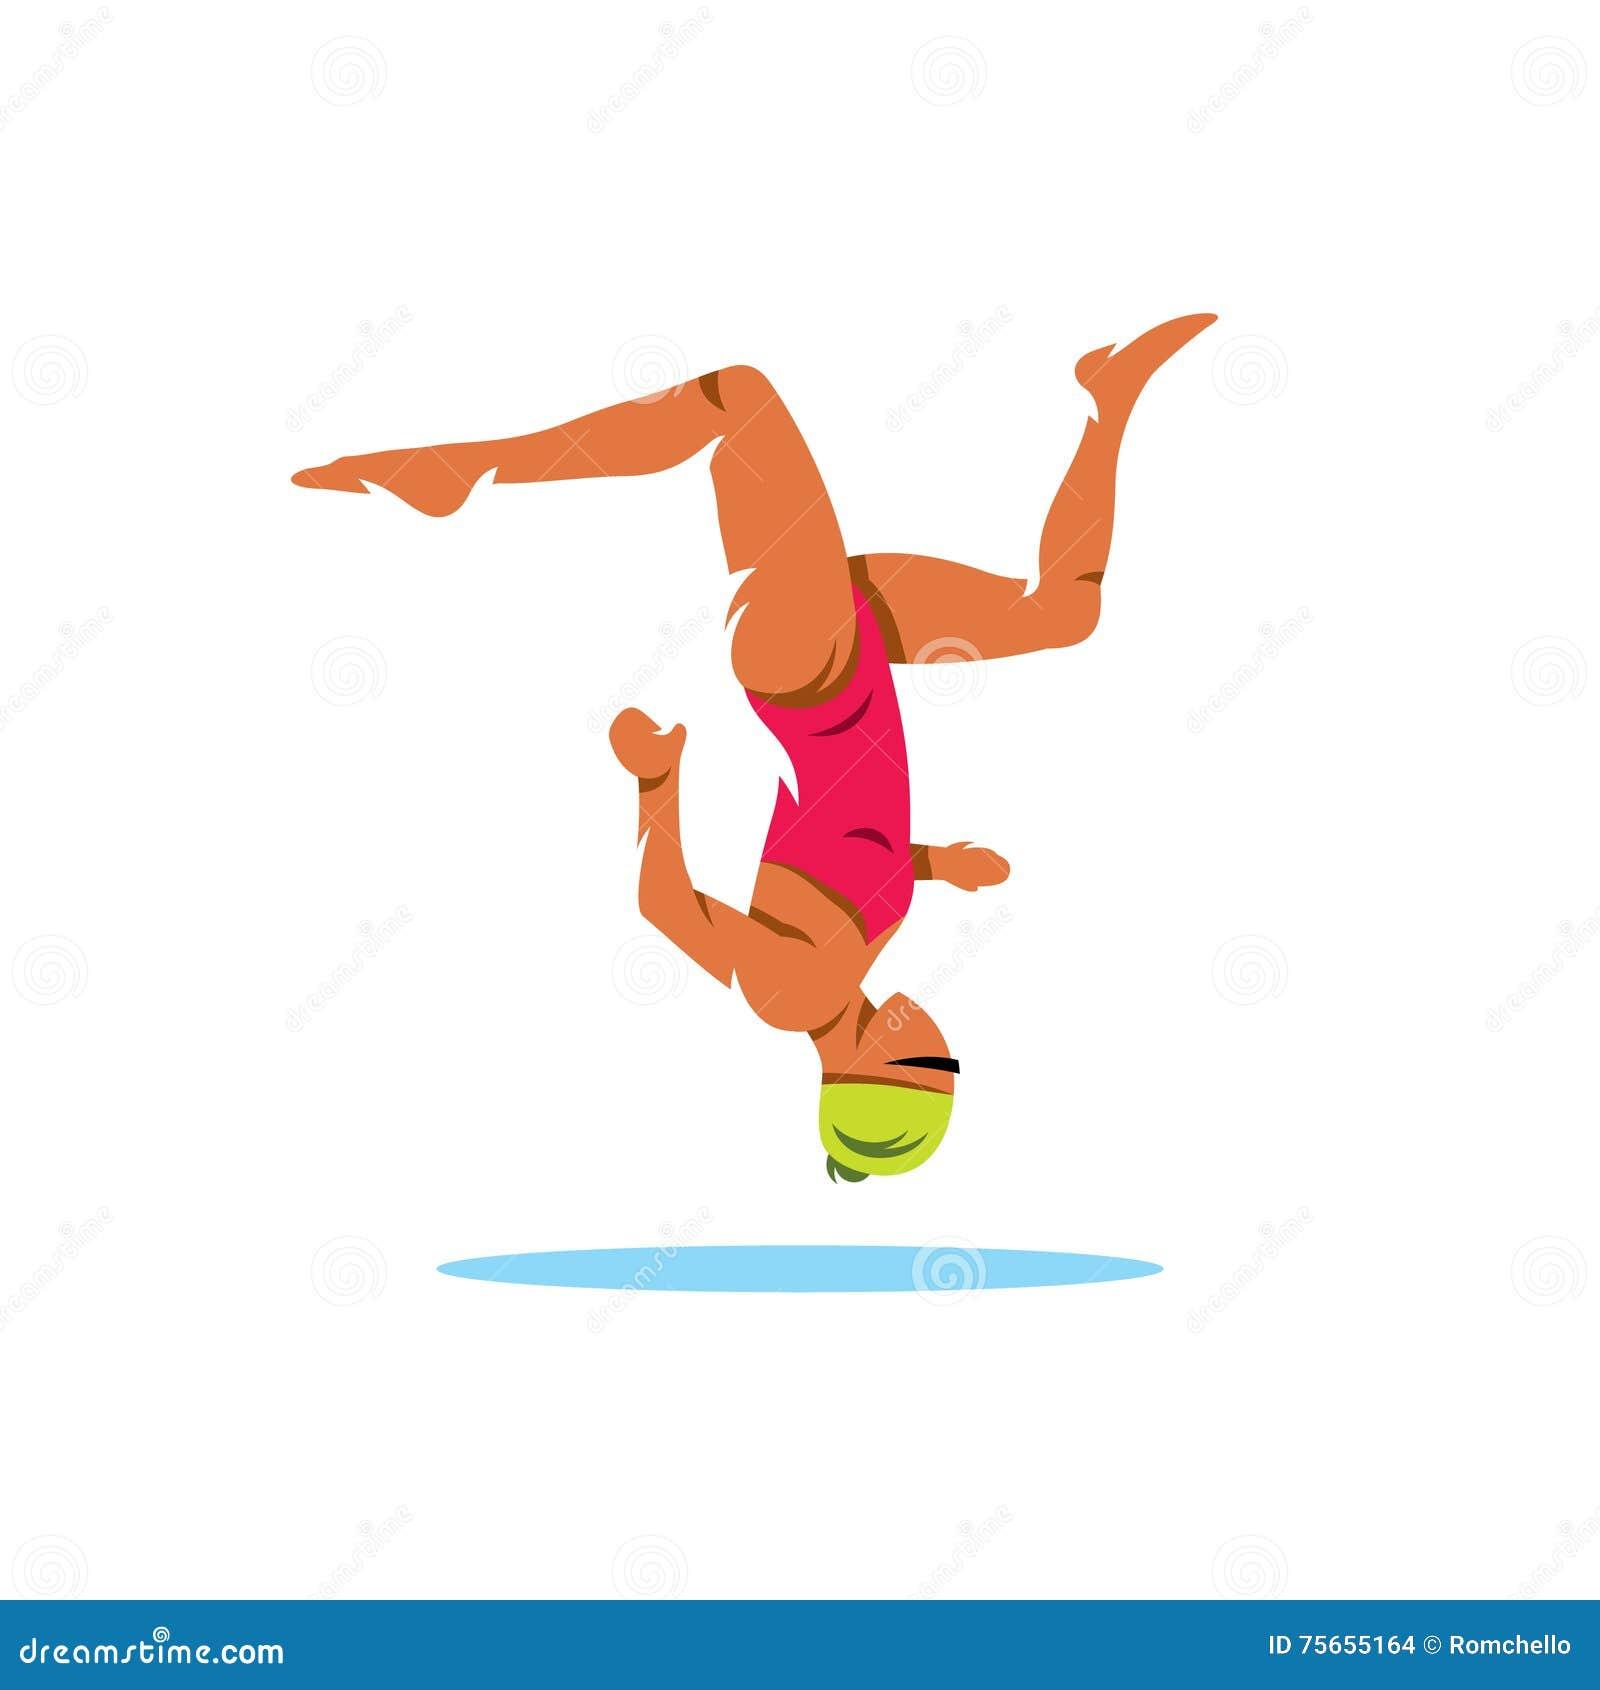 Natation synchronis e illustration de dessin anim de vecteur illustration de vecteur image - Dessin natation ...